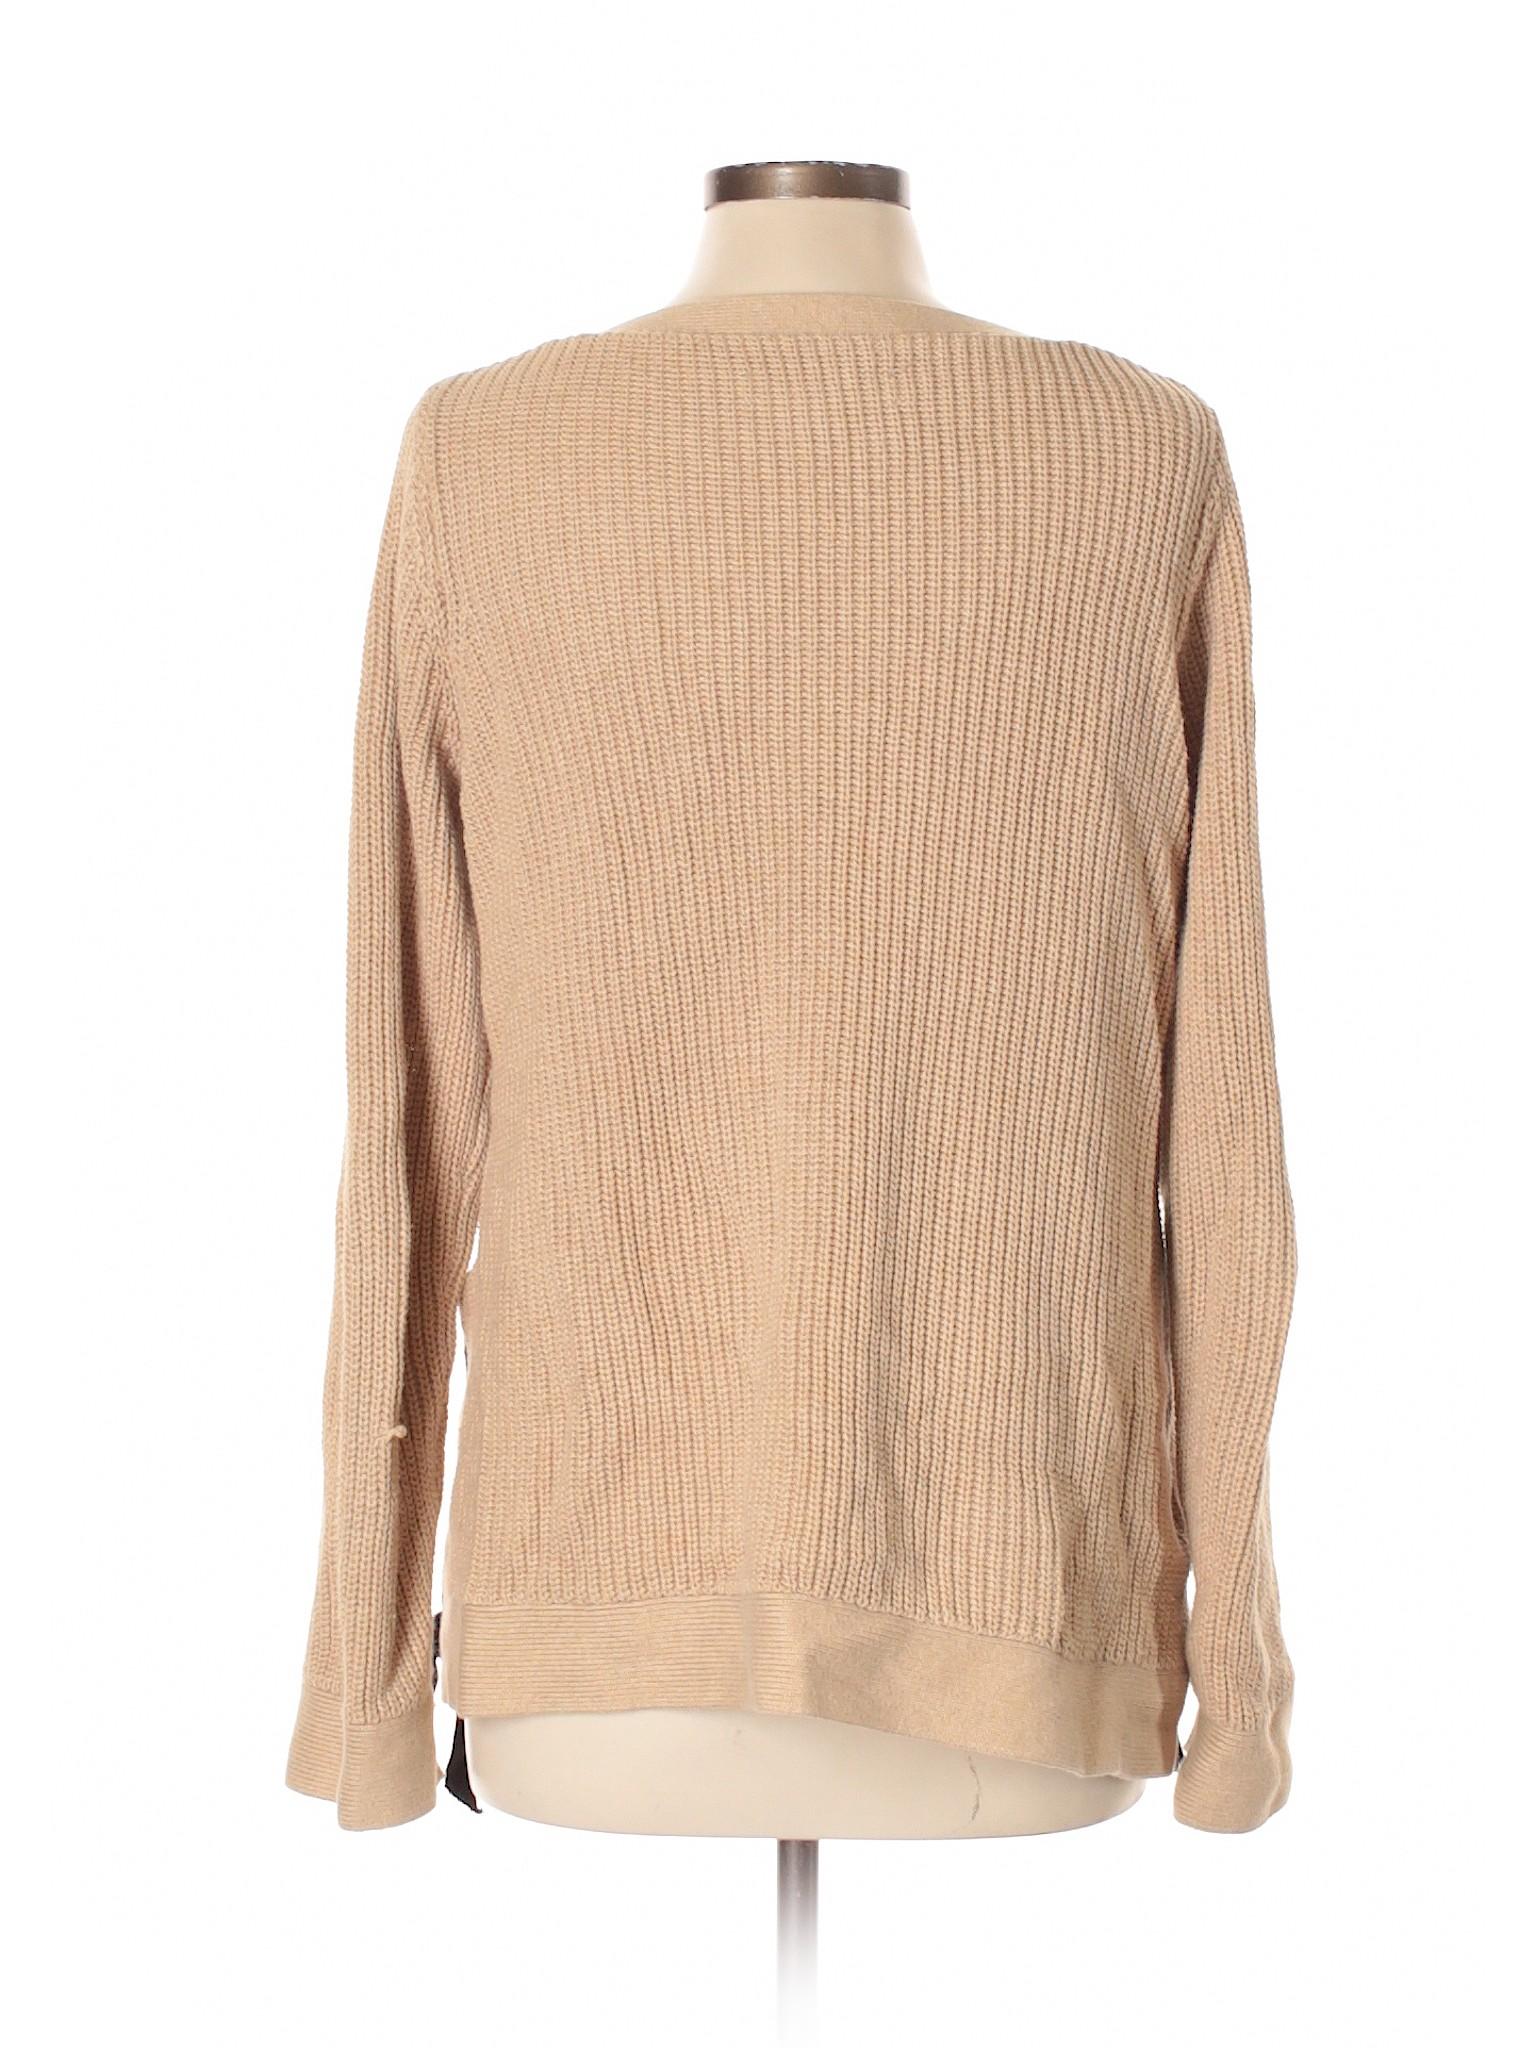 Taylor Boutique Sweater Pullover LOFT Ann vnqOHxwSz